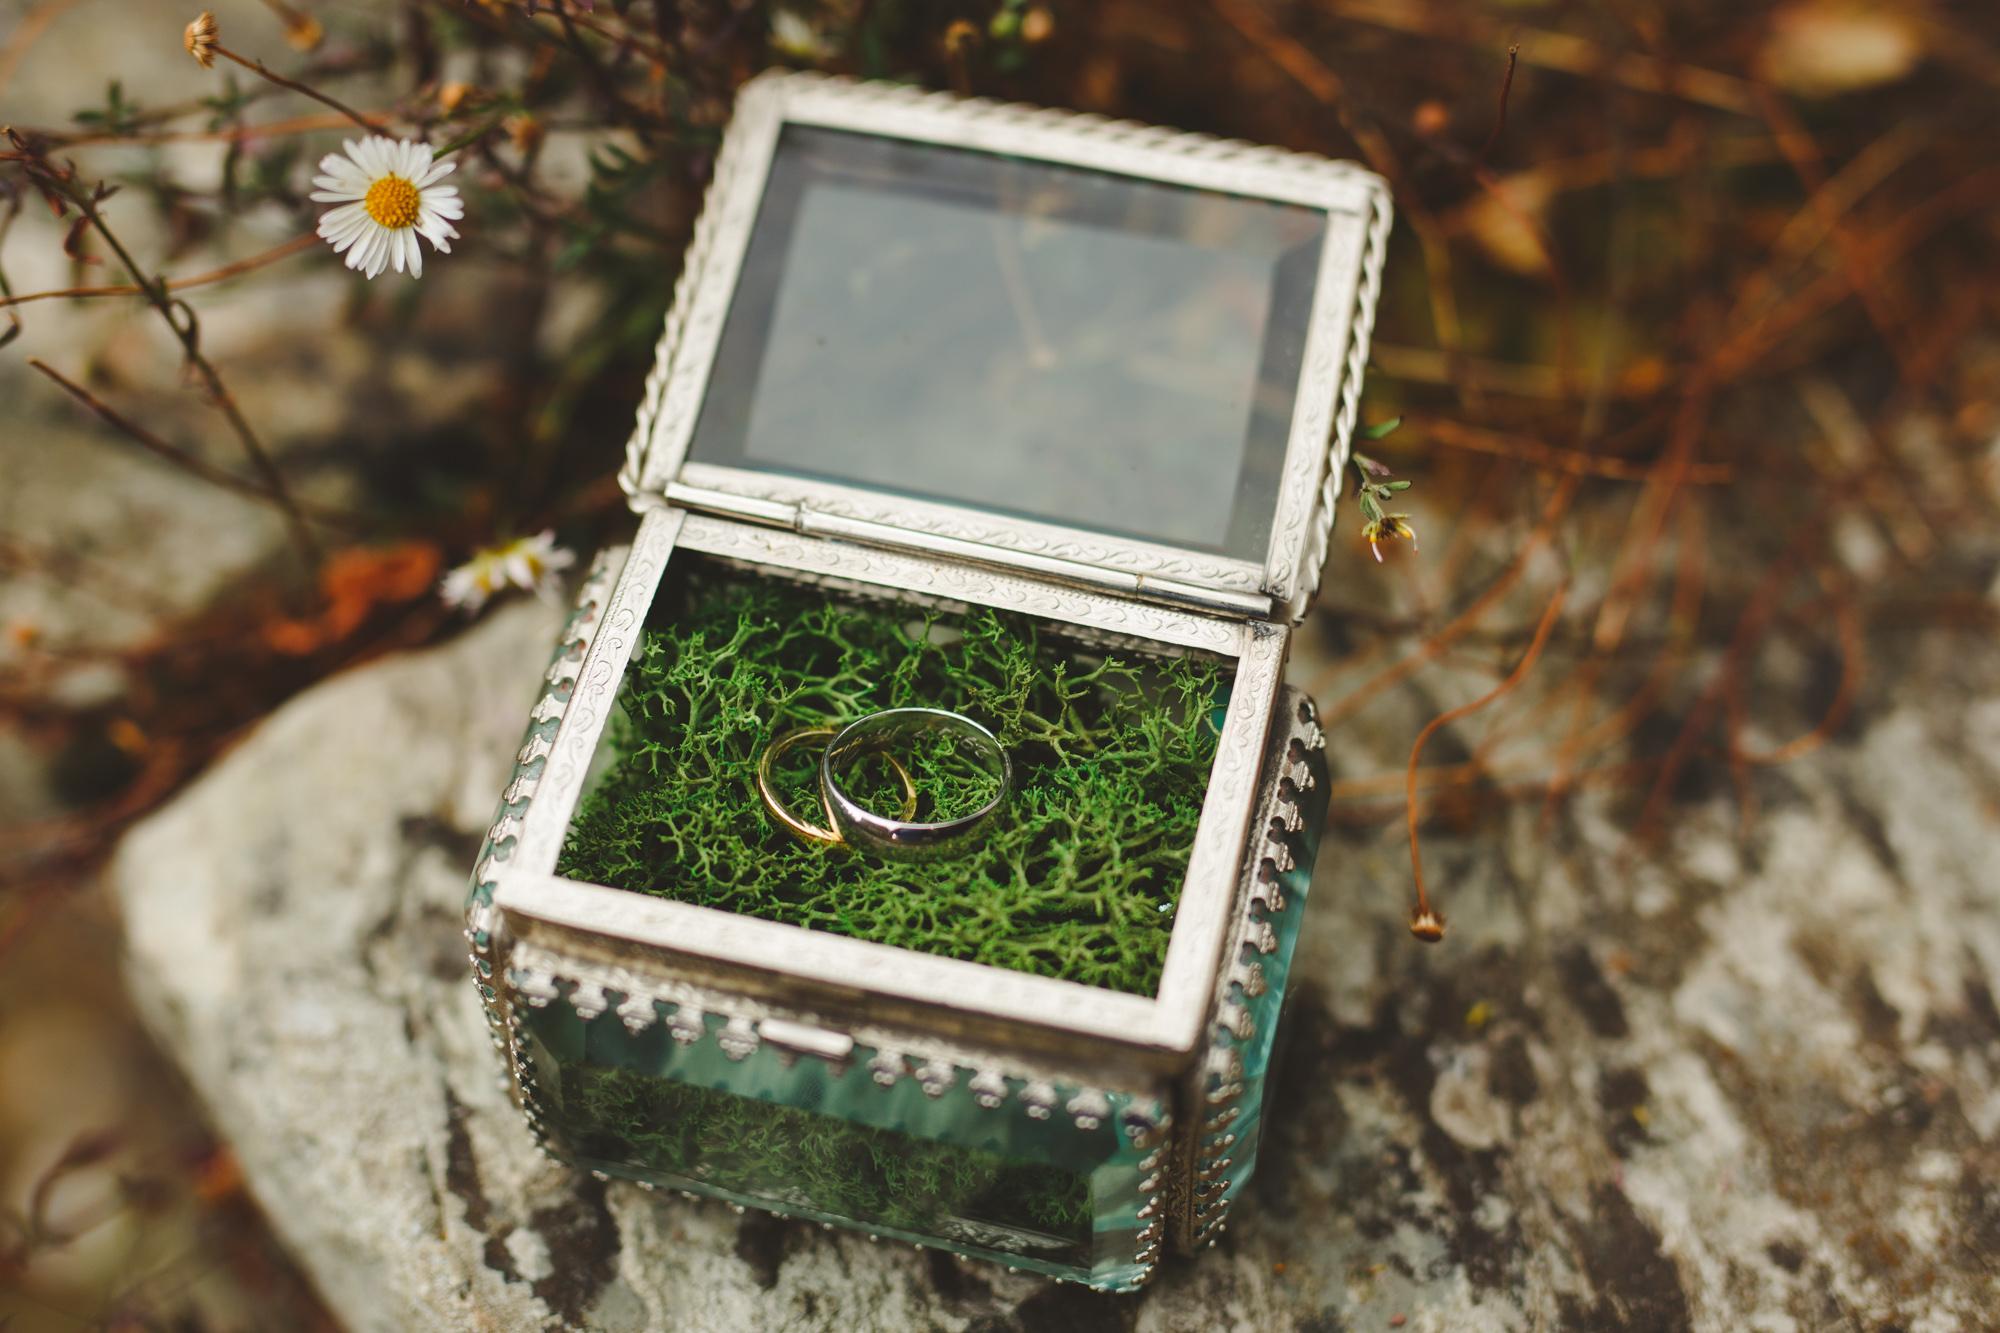 hestercombe-taunton-wedding-photography-camera-hannah-5.jpg